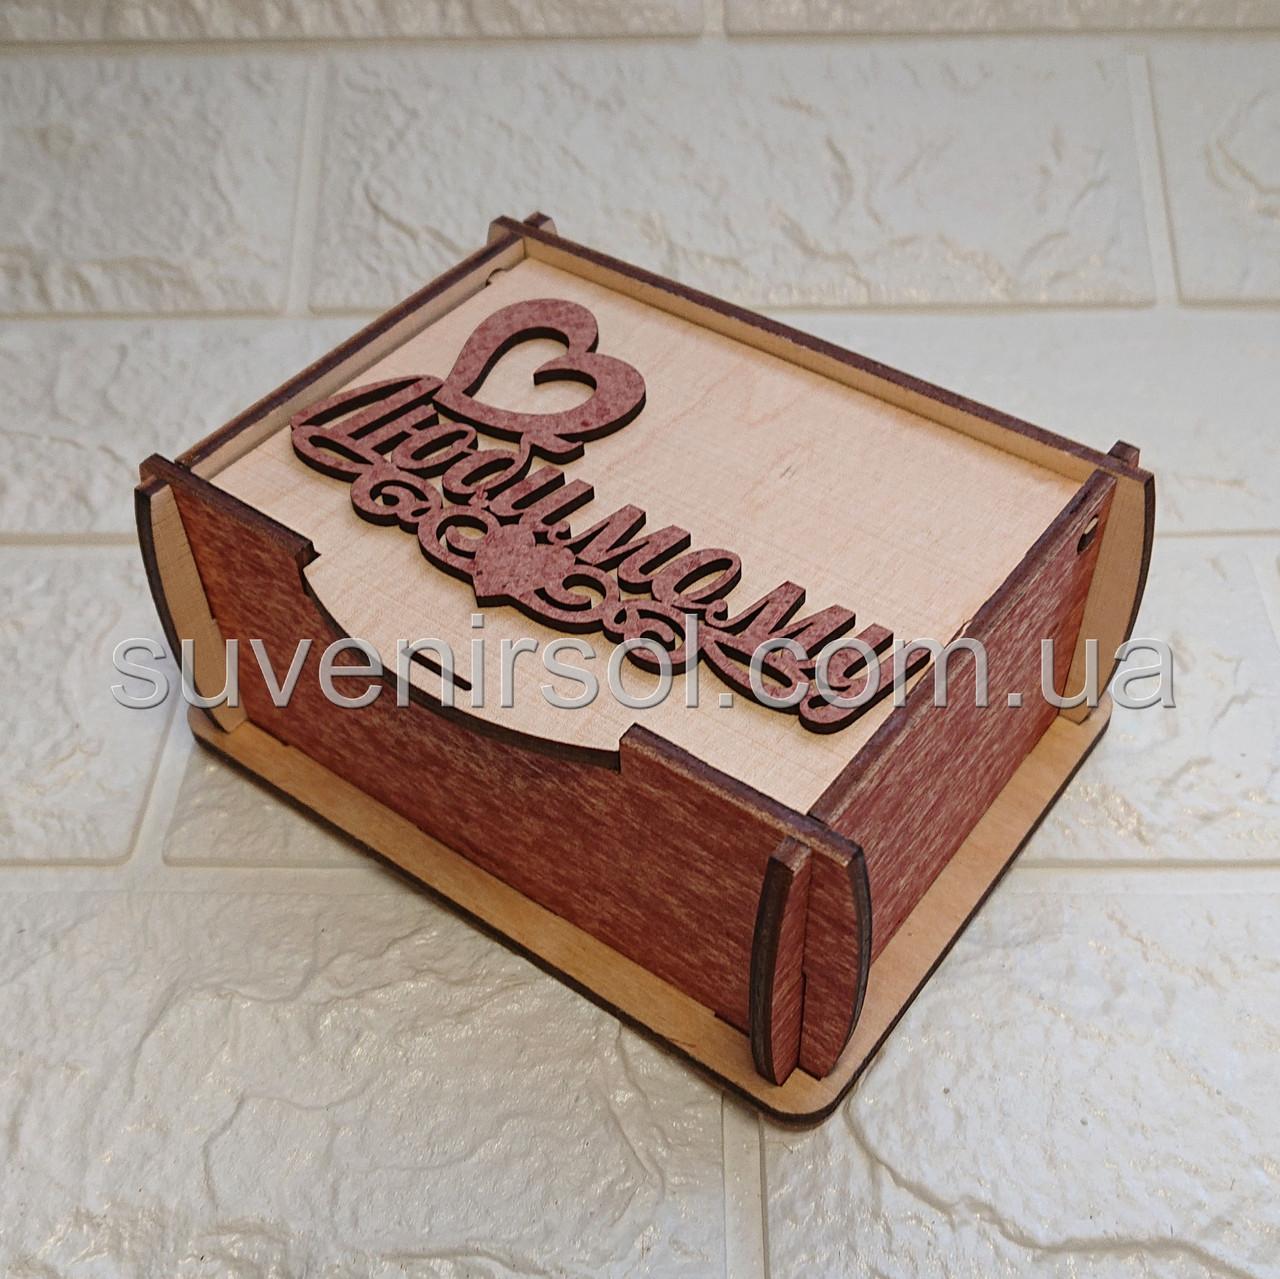 Скринька прямокутна з написом Коханому